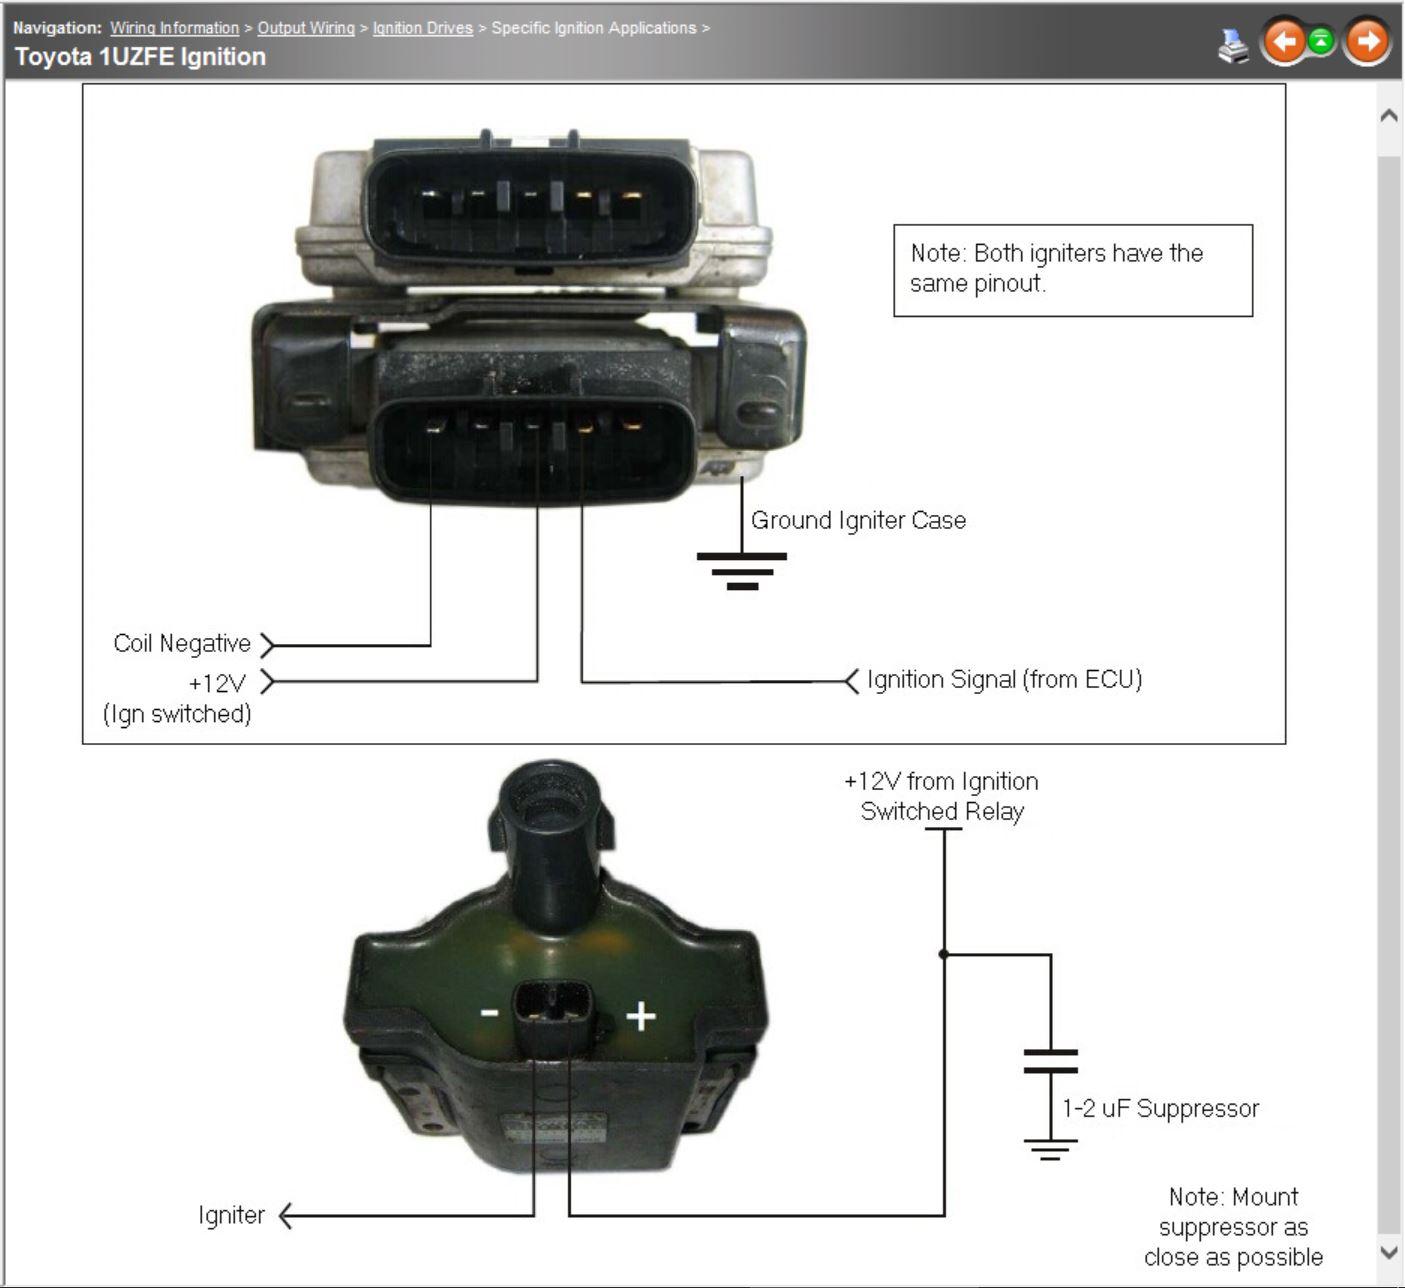 Lexus 1uzfe Help - G4 - Link Engine Management